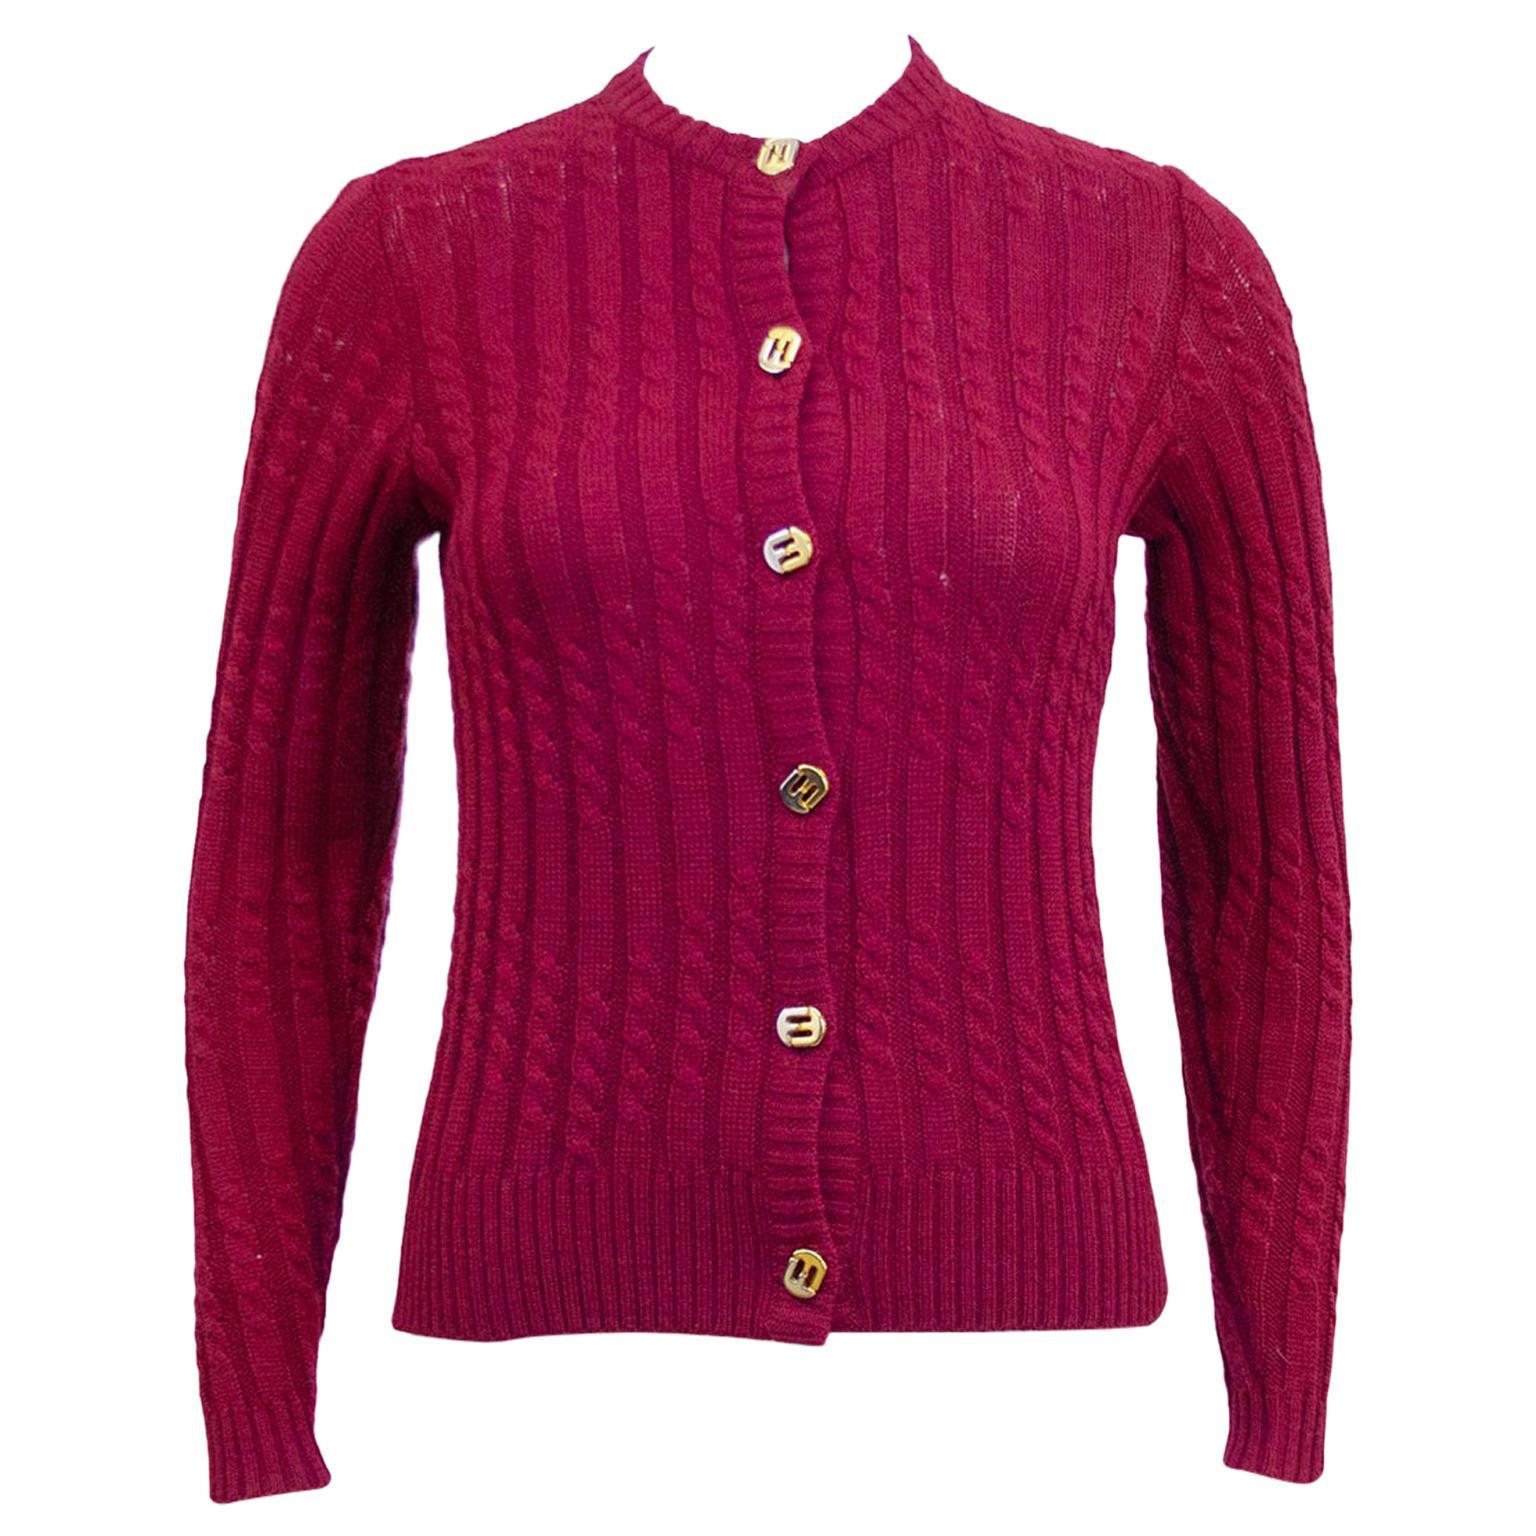 1970's Ferragamo Ribbed & Cable Burgundy Knit Cardigan